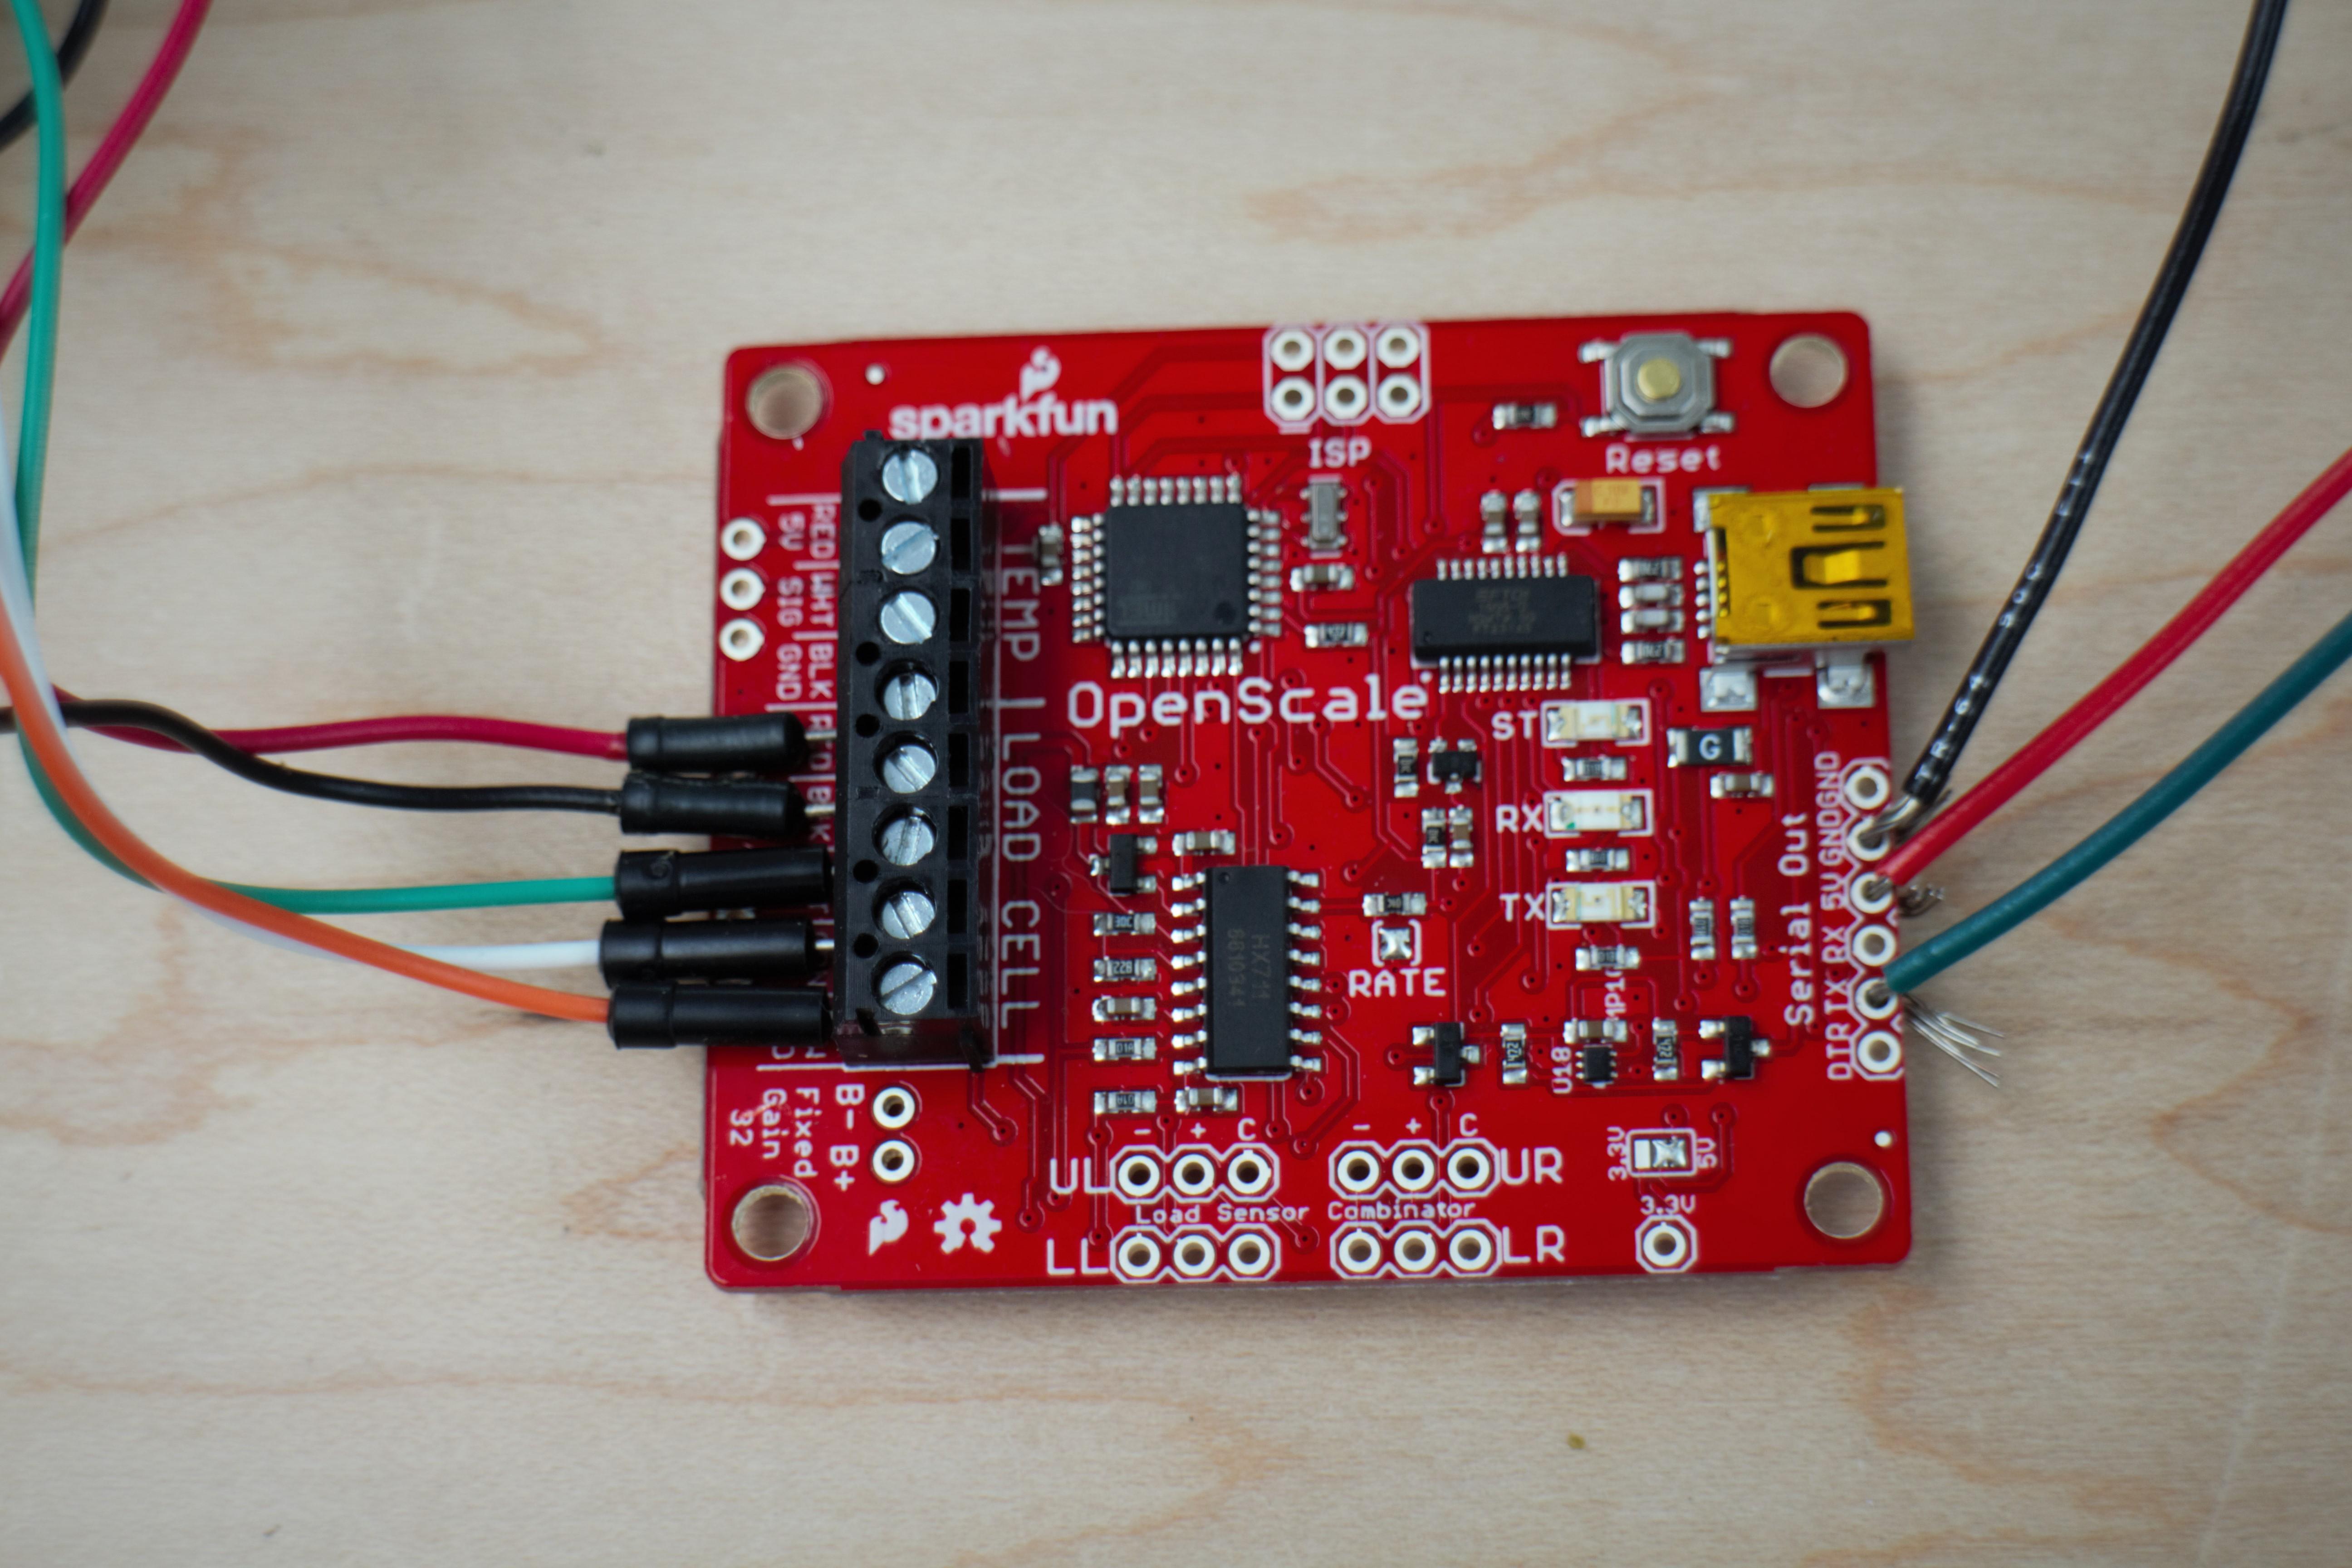 Dual Xd7500 Wiring Diagram